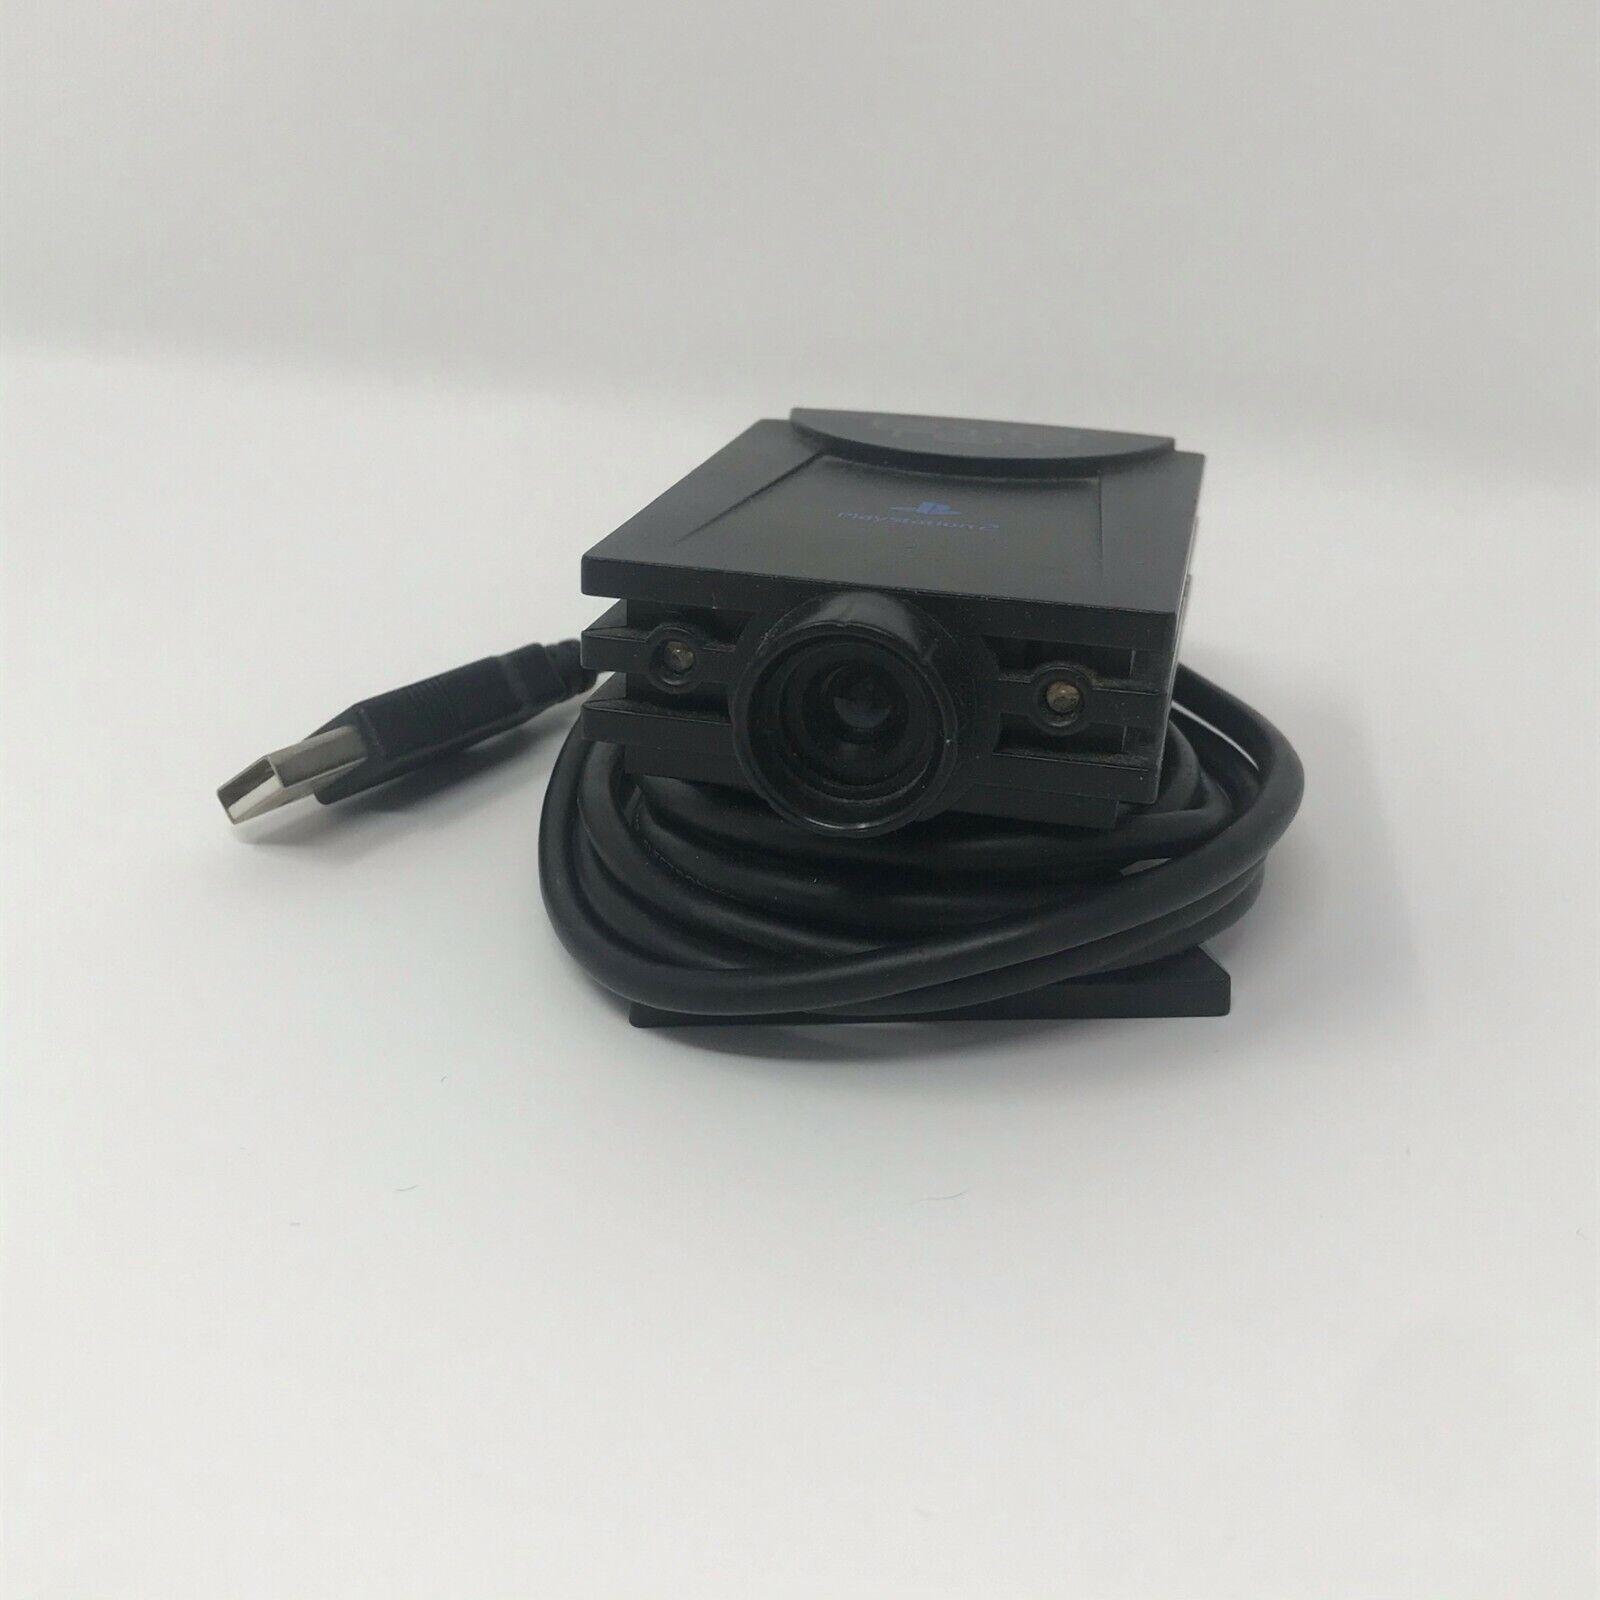 PS2 Black Eye Toy USB Camera - Playstation 2 + Eye Toy Play Game PS2